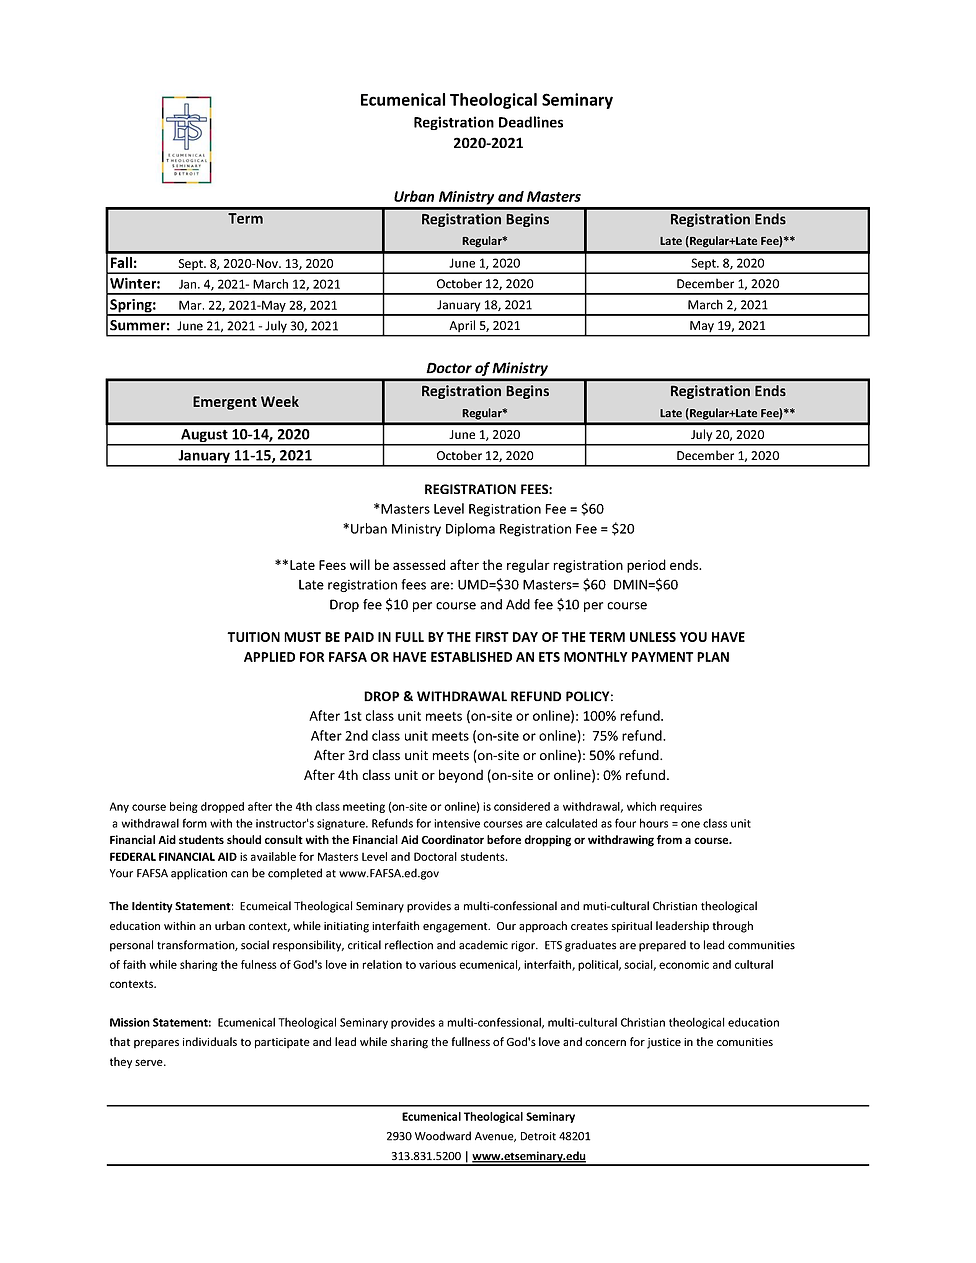 ETS Registration Deadlines 2020-2021 Rev